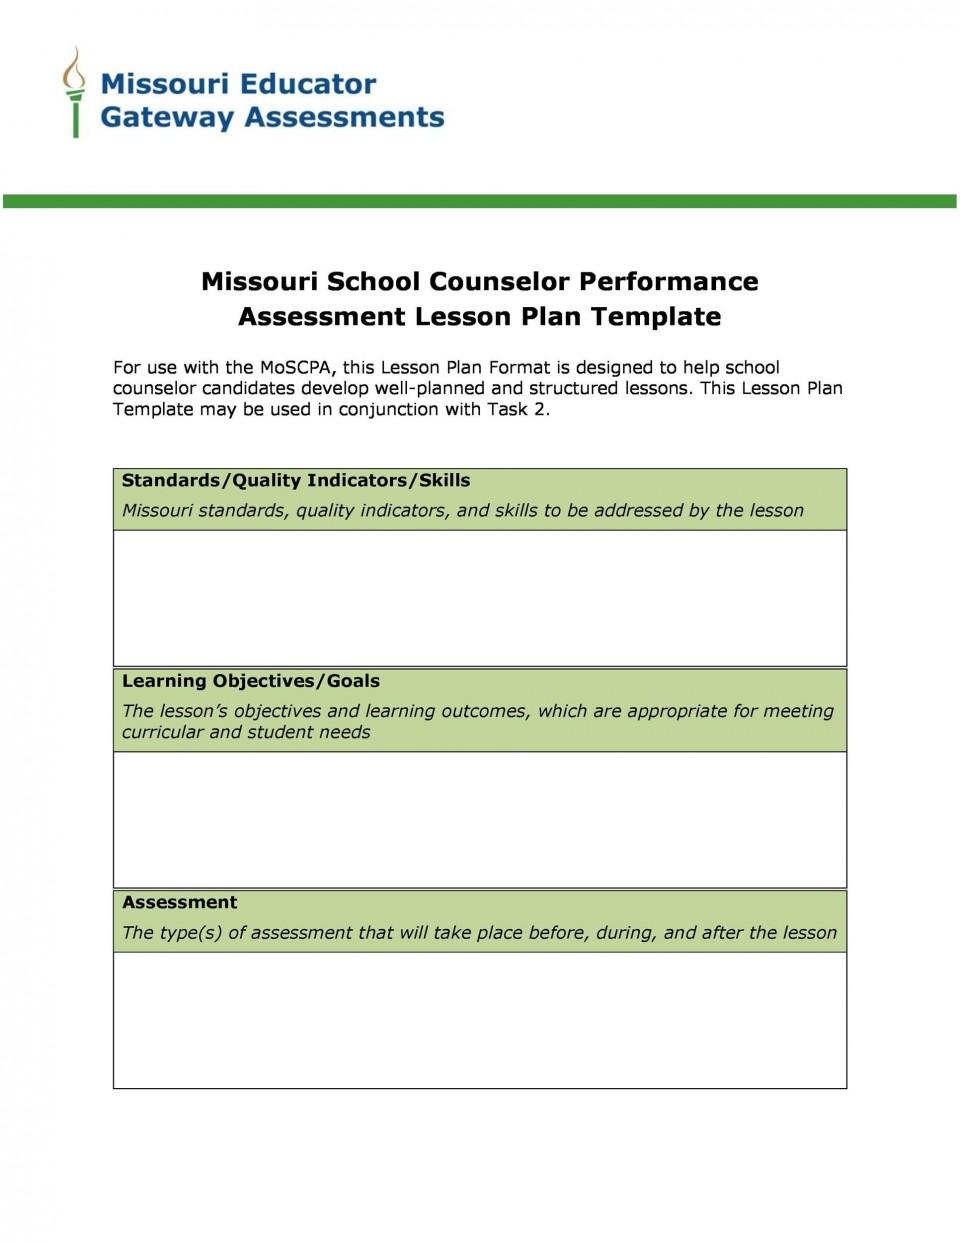 004 Astounding Weekly Lesson Plan Template Editable High Resolution  Google Doc Preschool Downloadable Free960